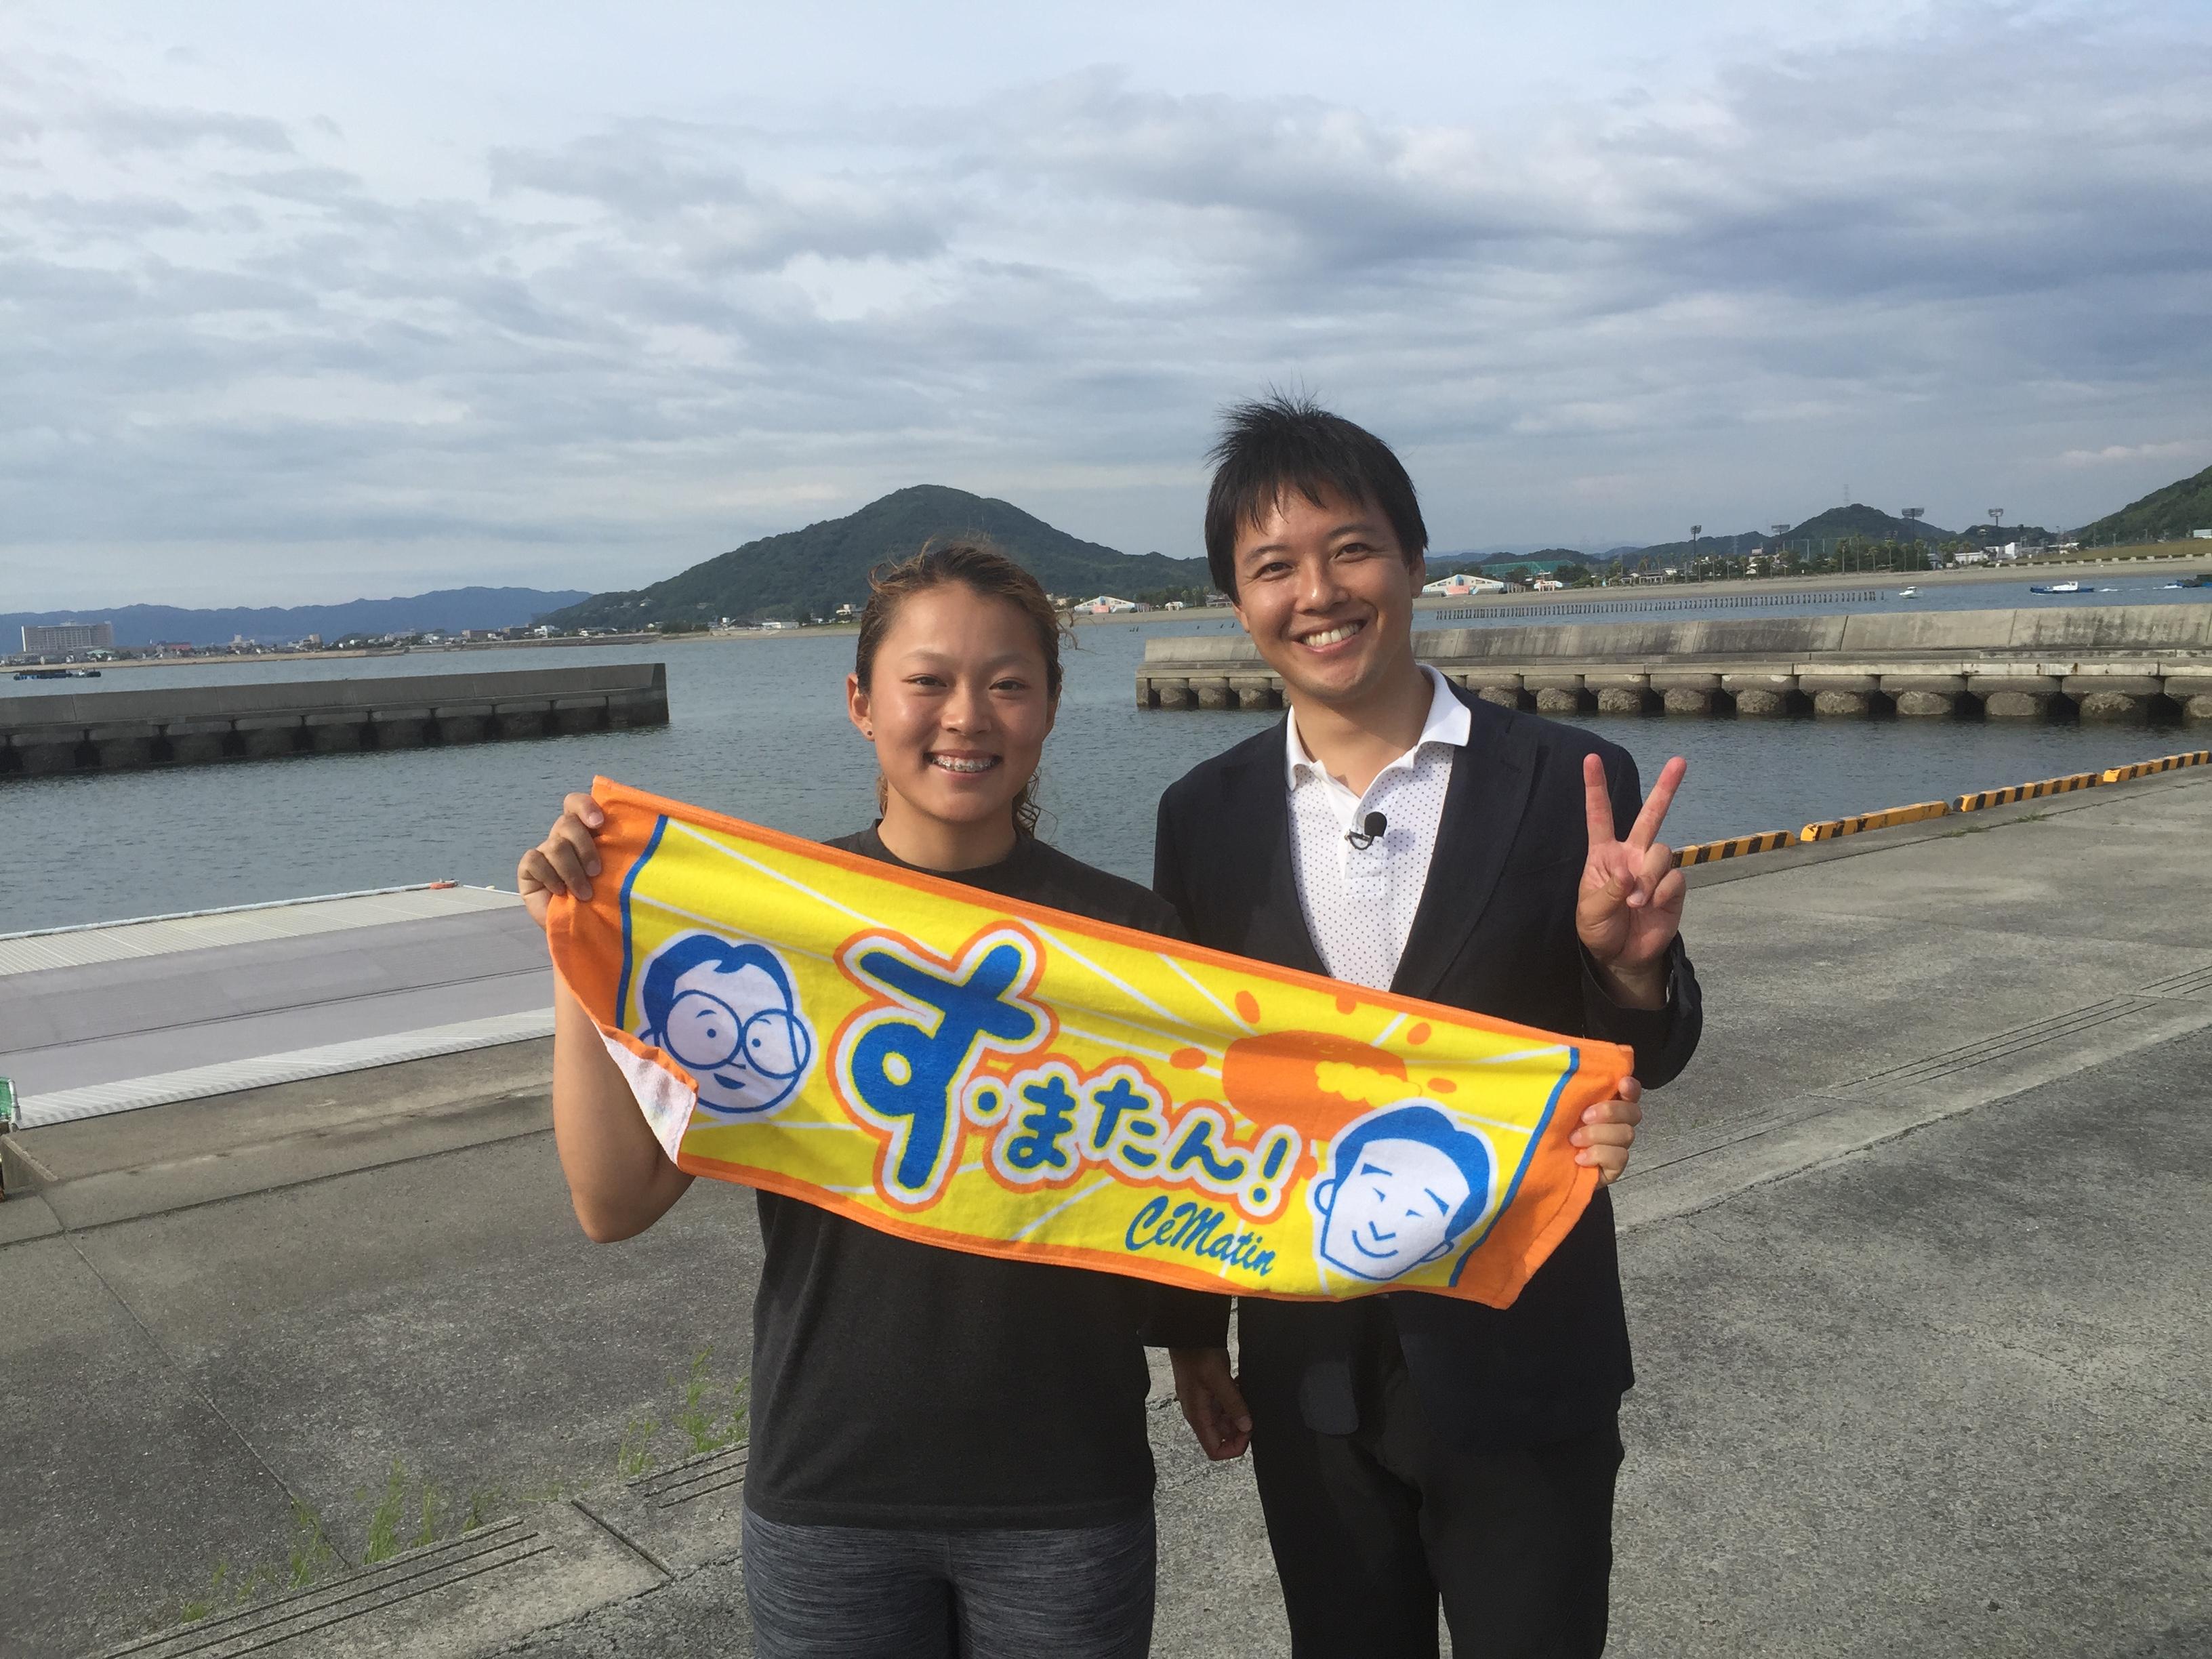 http://www.ytv.co.jp/blog/ana/tatsuta/IMG_8576.JPG